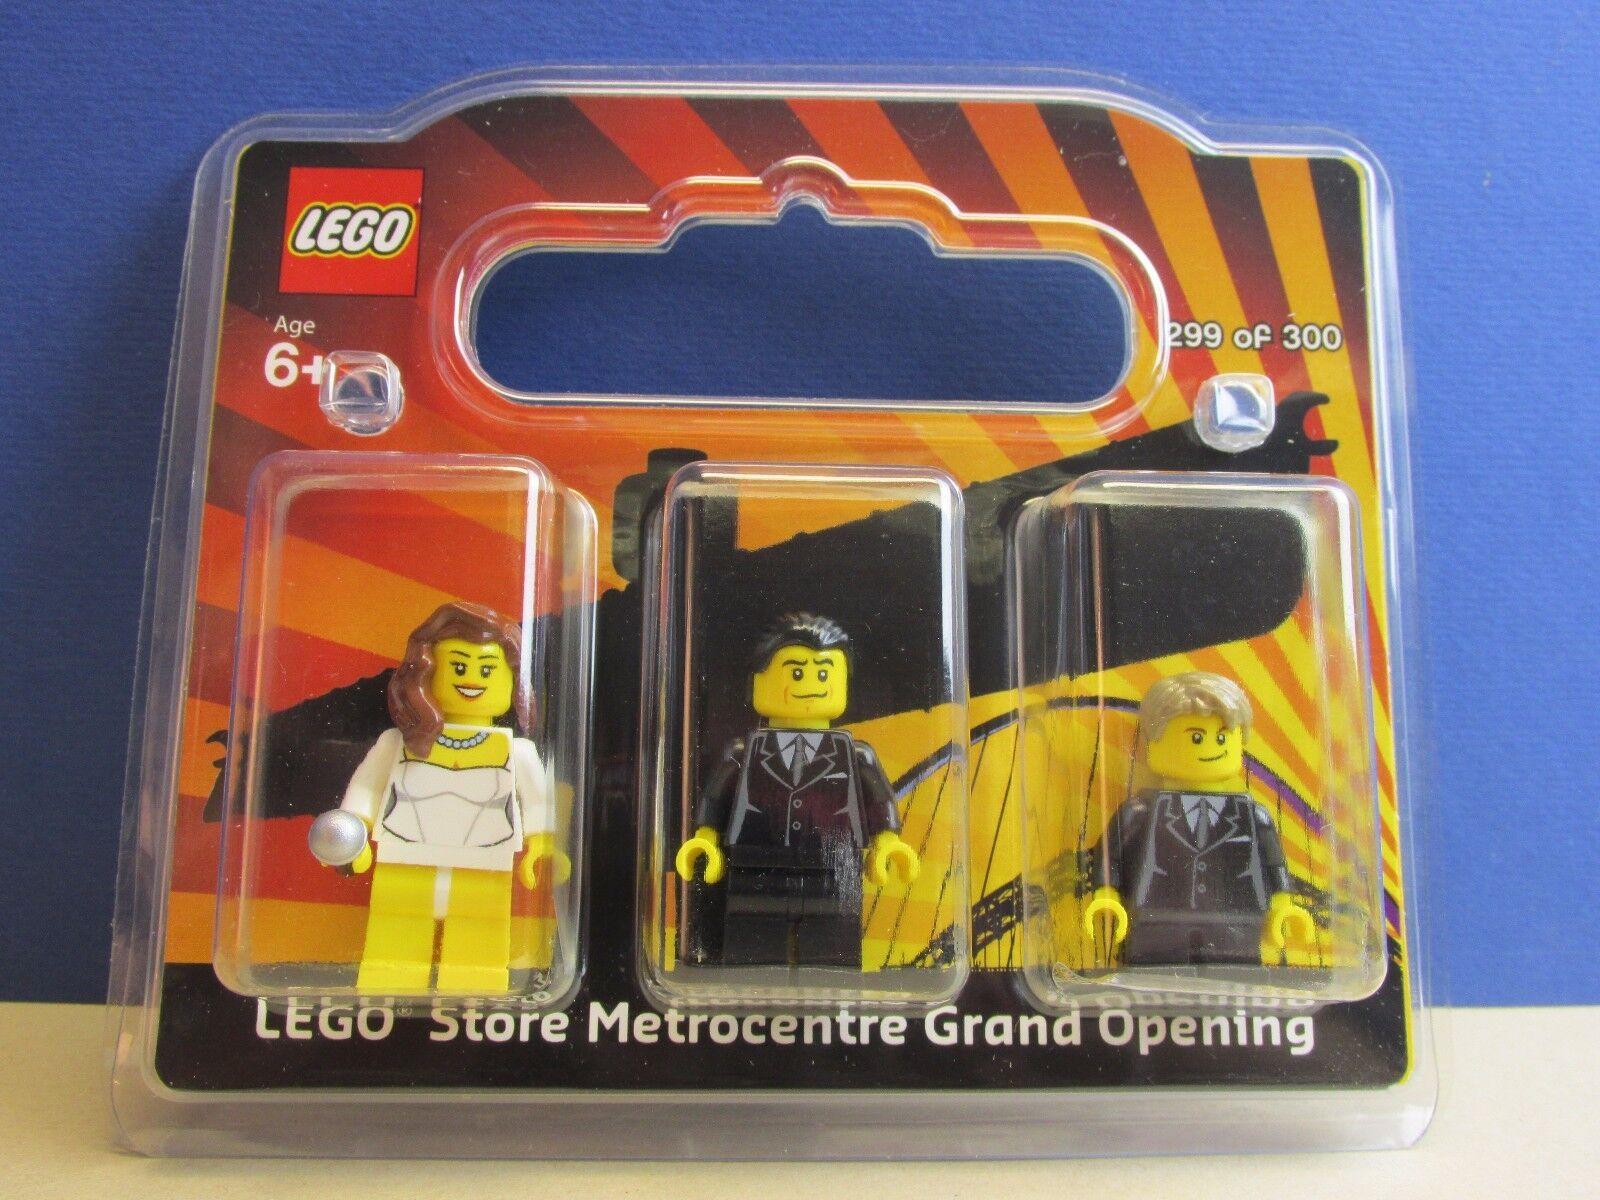 Lego ANT & DEC X FACTOR SET minifigure NEWCASTLE STORE rare like mr Gold 299 300